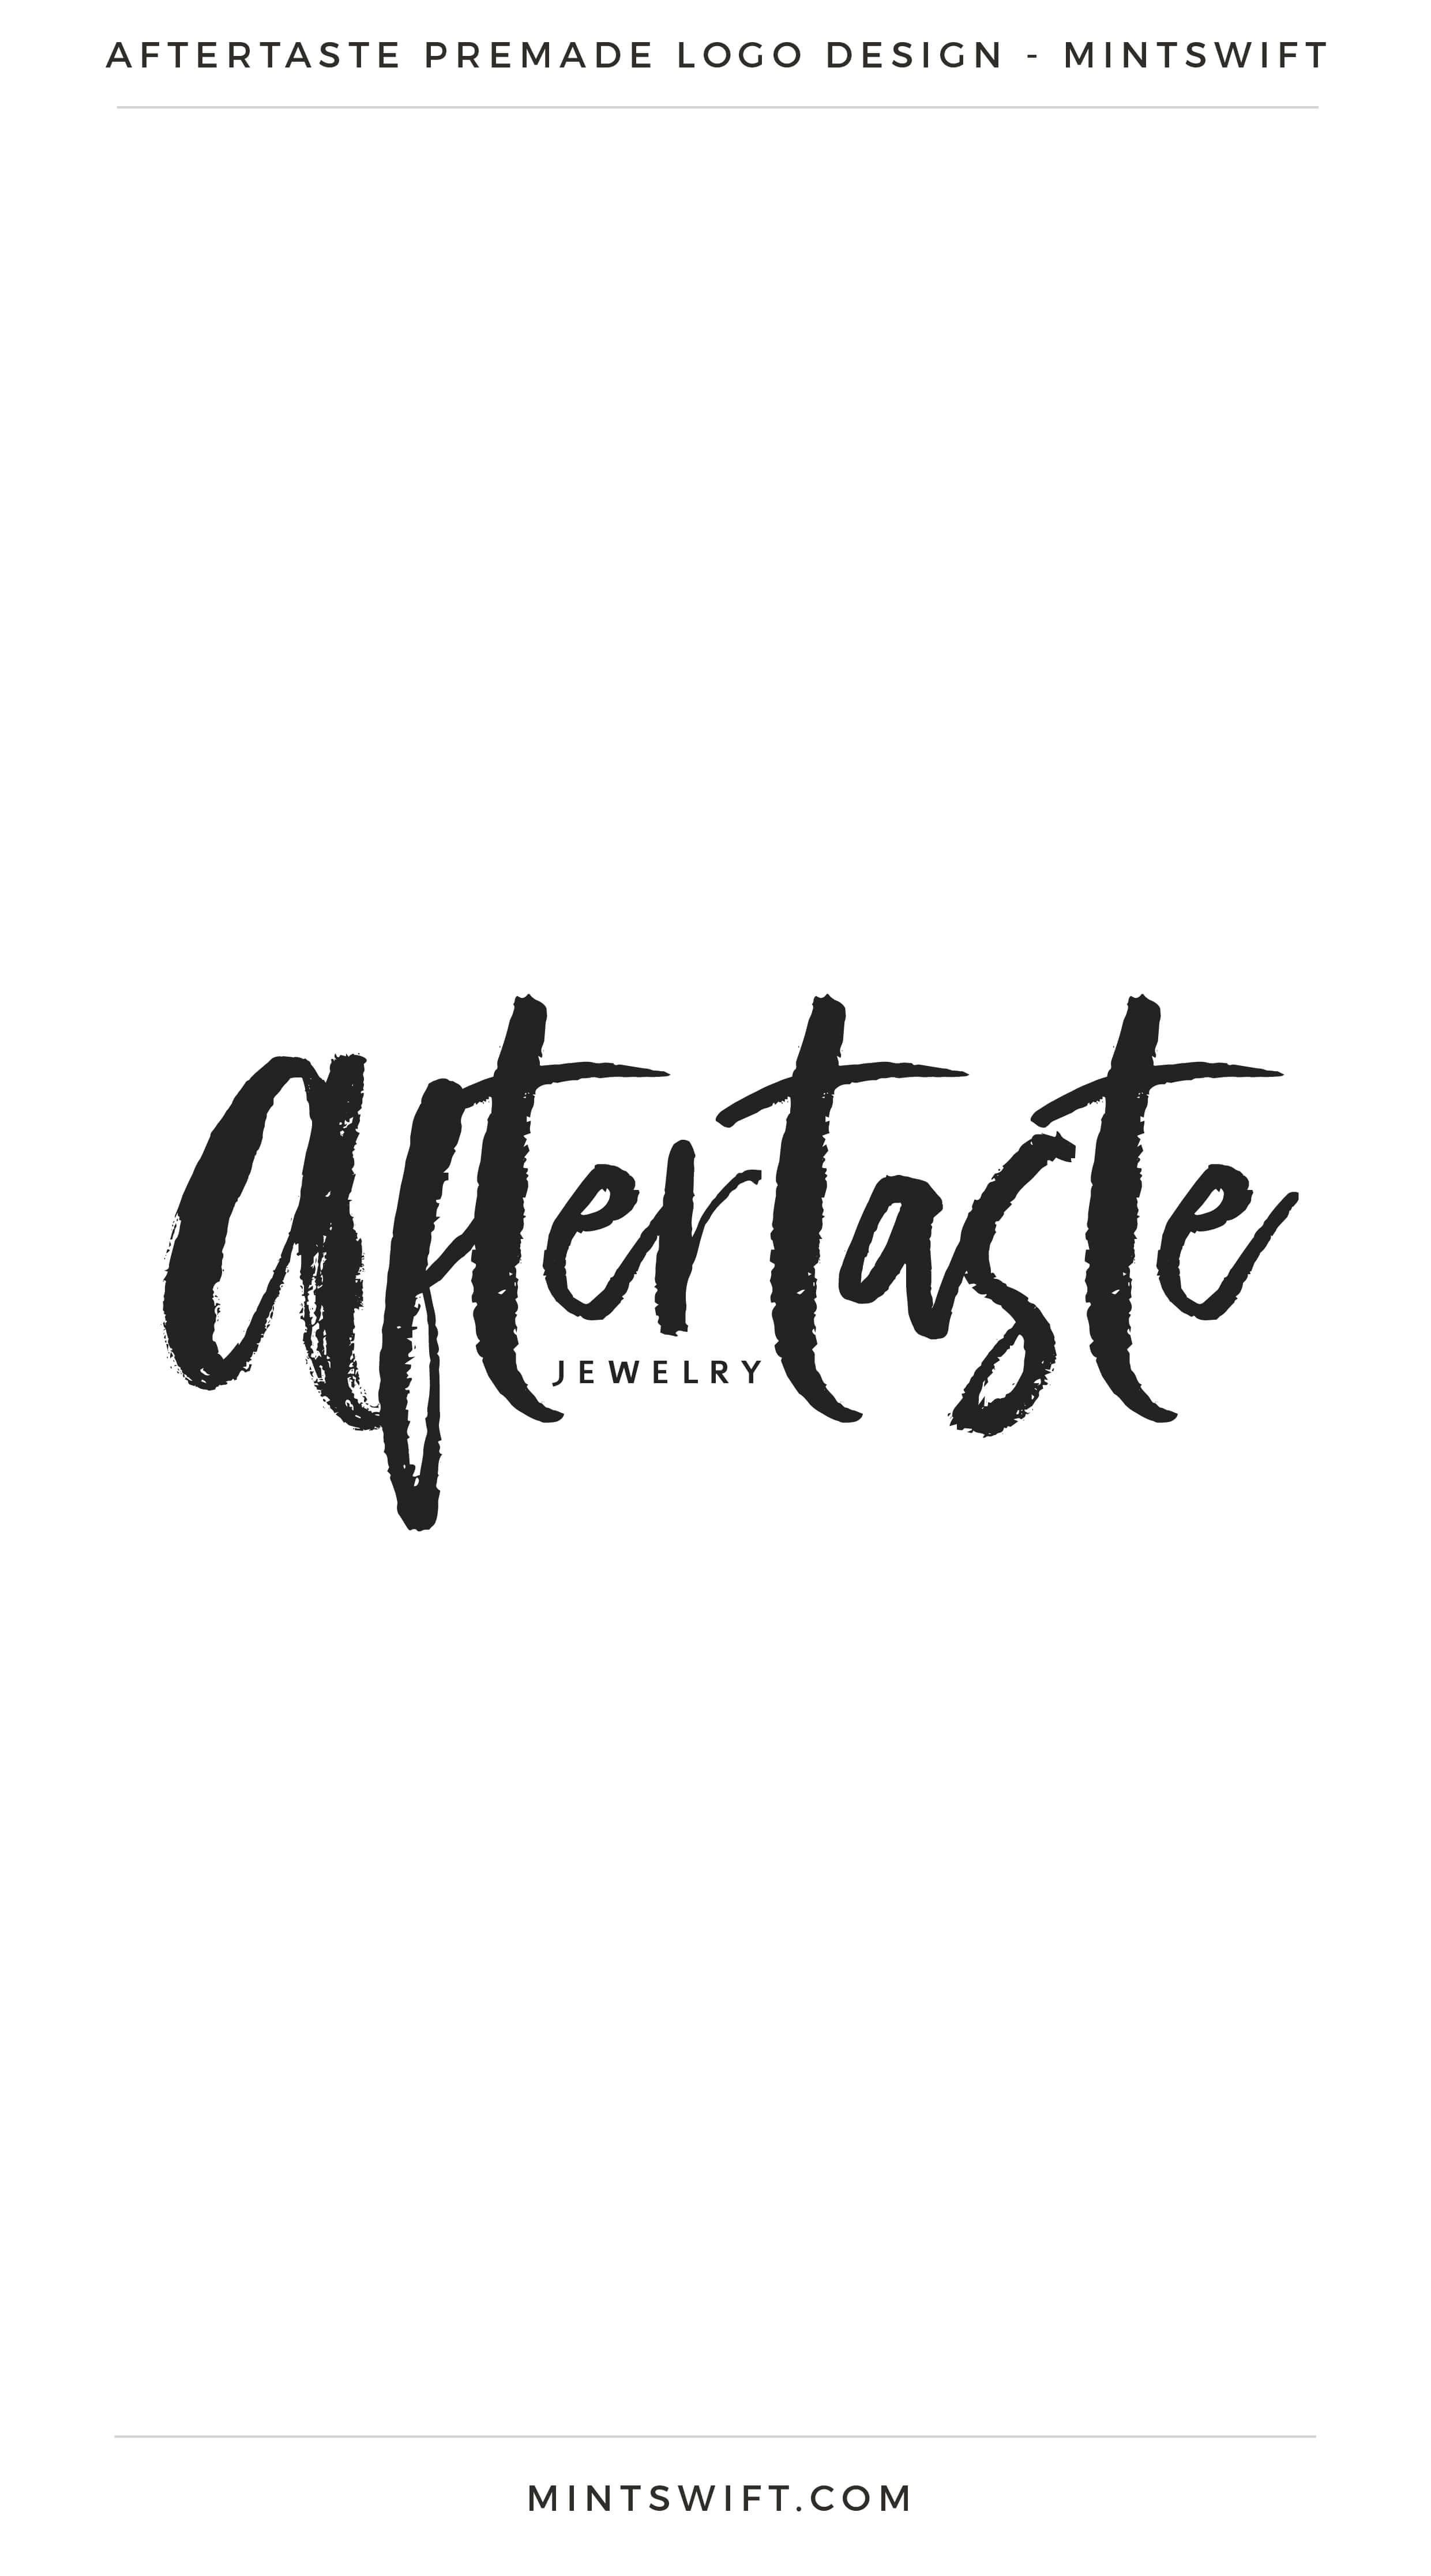 Aftertaste Premade Logo | Premade Logo | Premade logos | Pre-made logo | Premade Brand Design| Branding | Brand Design | Logo Shop | Branding kits shop | MintSwift Shop | Premade logo design | Add-On | Logo Design | MintSwift| Adrianna Glowacka | MintSwift Design